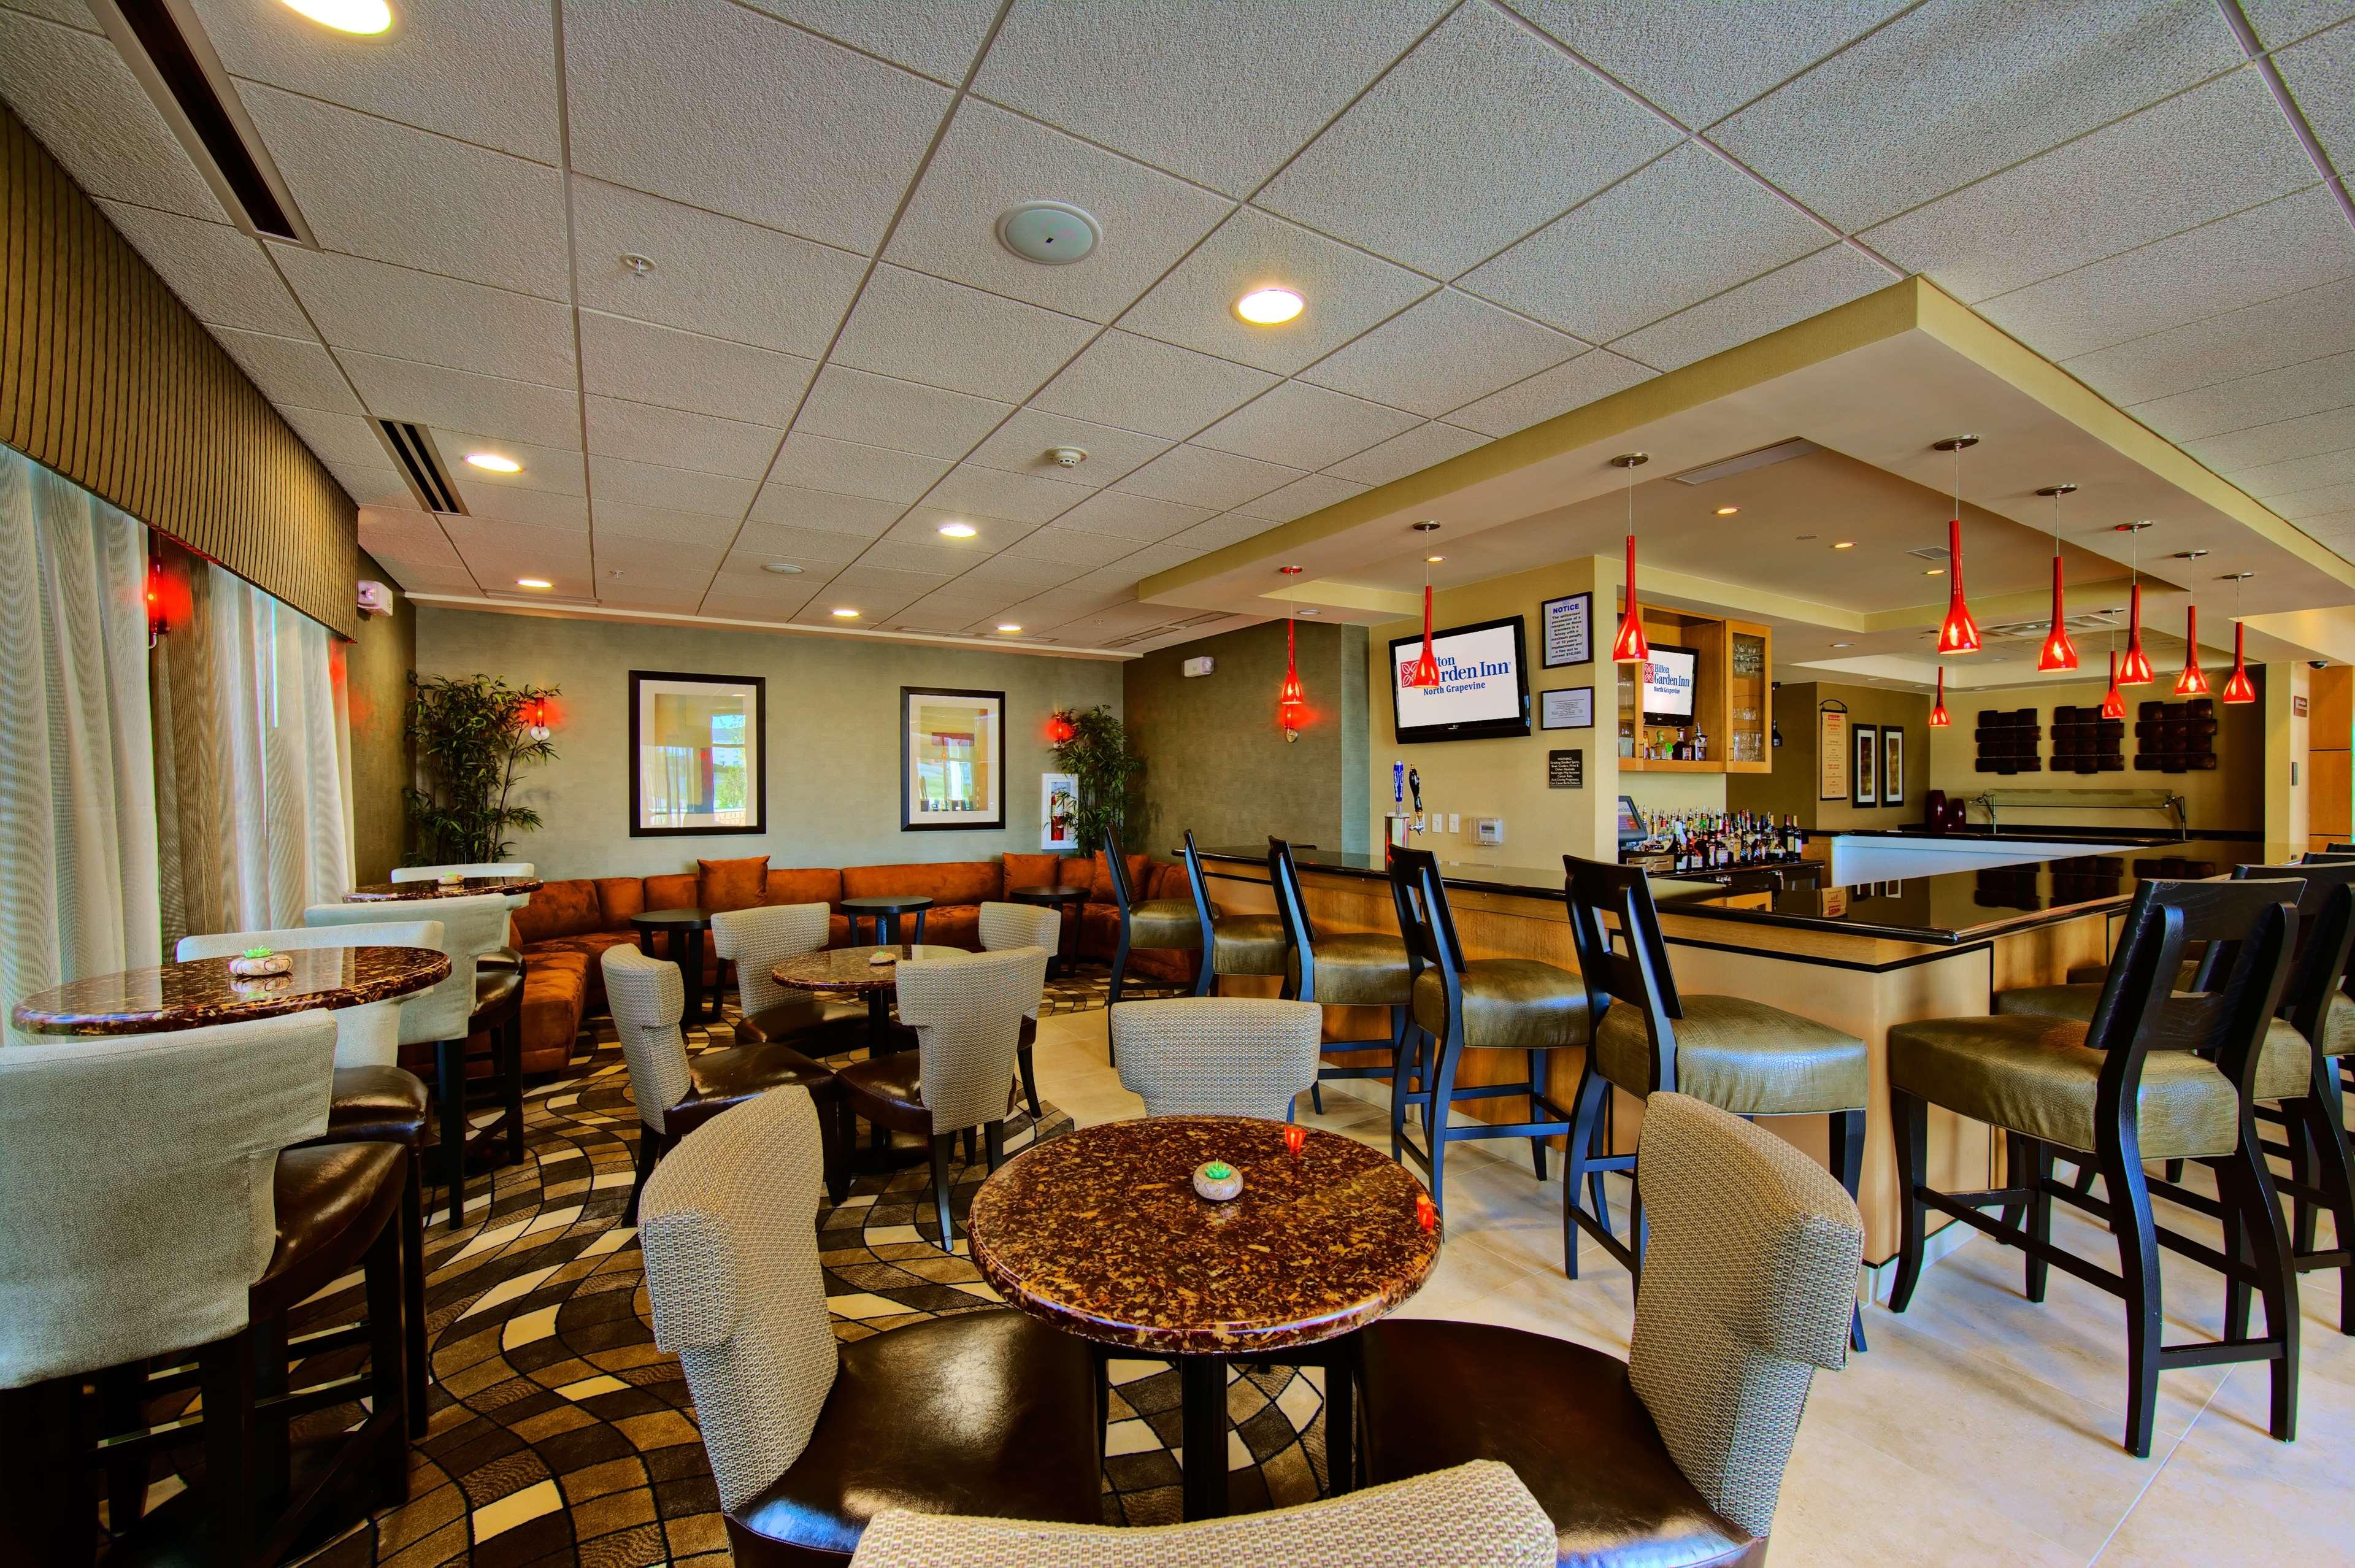 Hilton Garden Inn DFW North Grapevine image 46